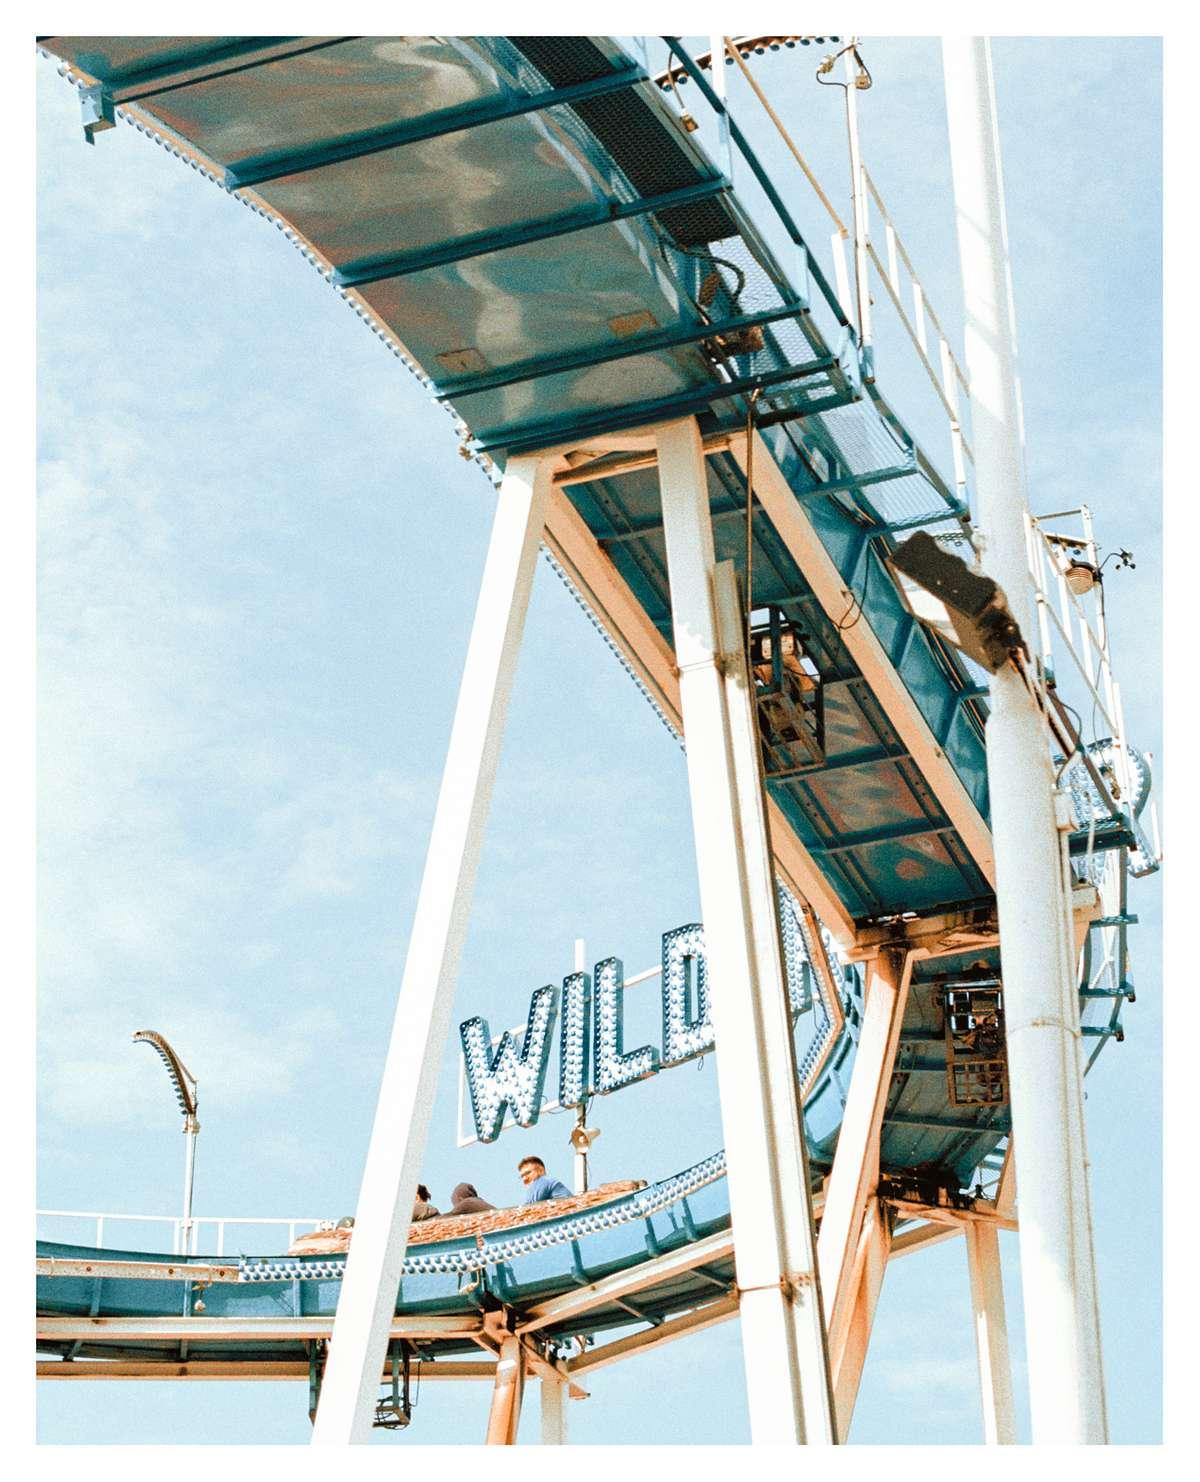 'WILD' - 16.2 x 20 inches - £80